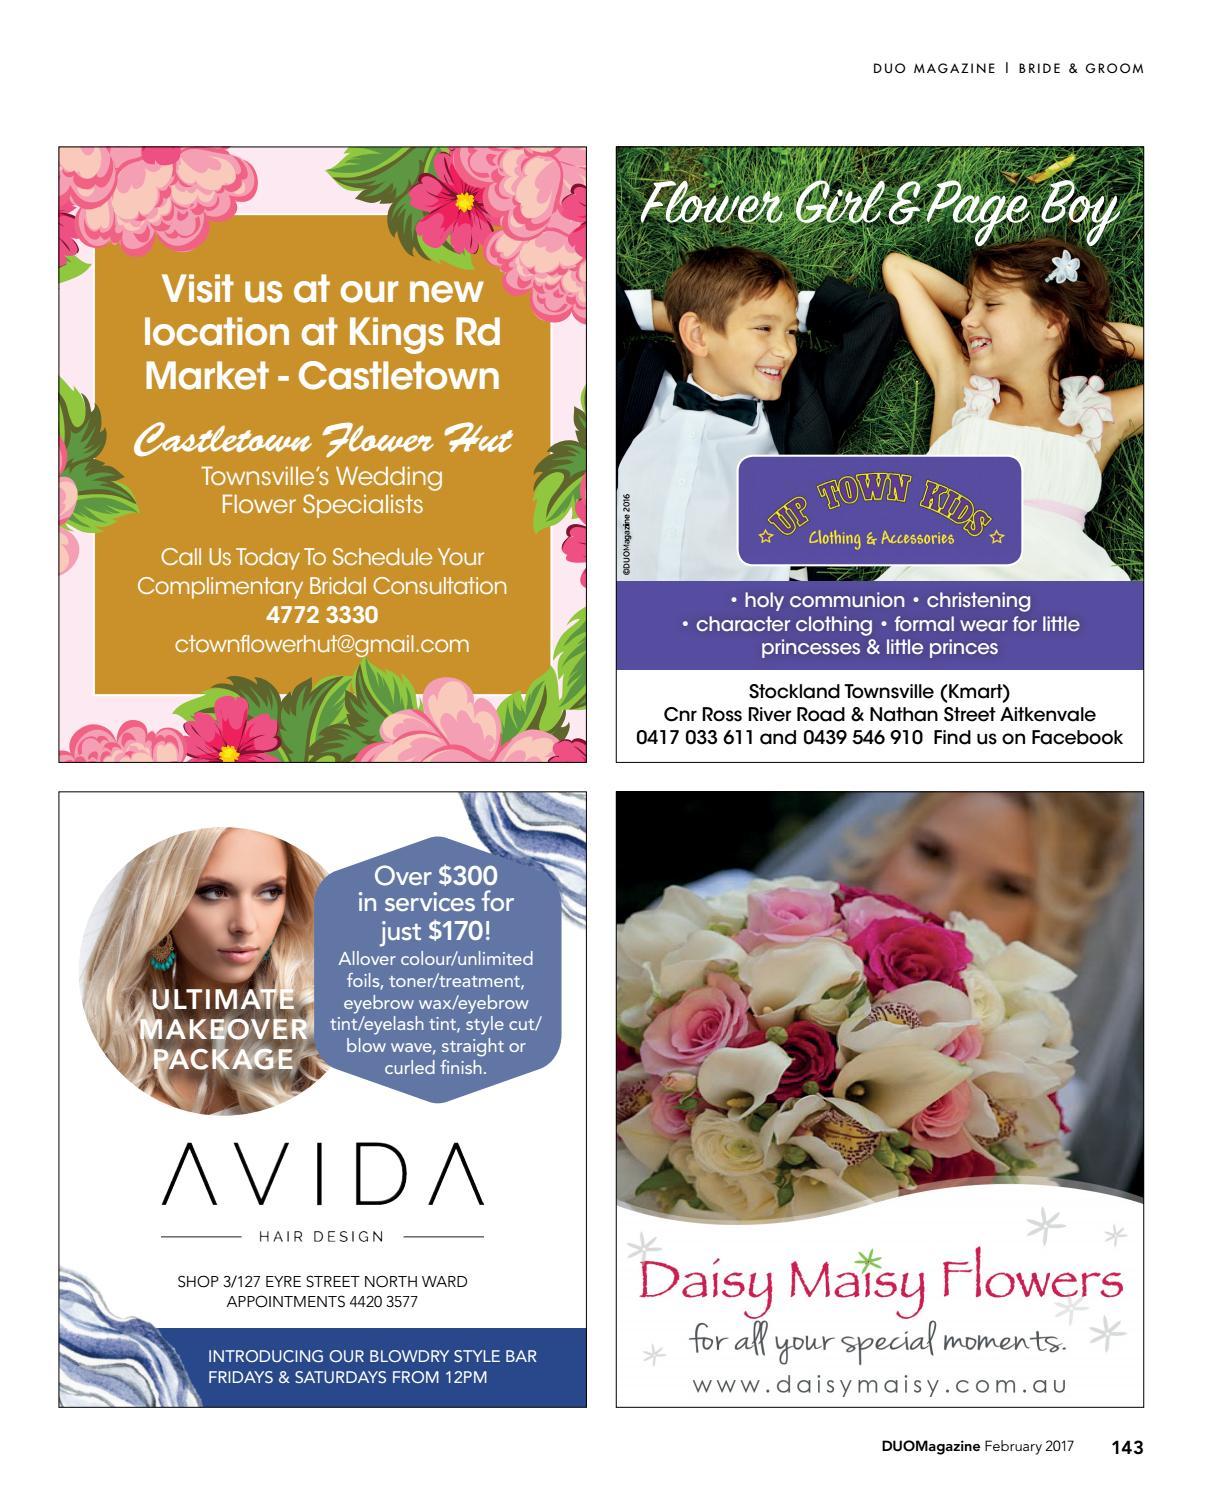 Daisy maisy flowers choice image flower wallpaper hd duo magazine february 2017 by duo magazine issuu izmirmasajfo izmirmasajfo